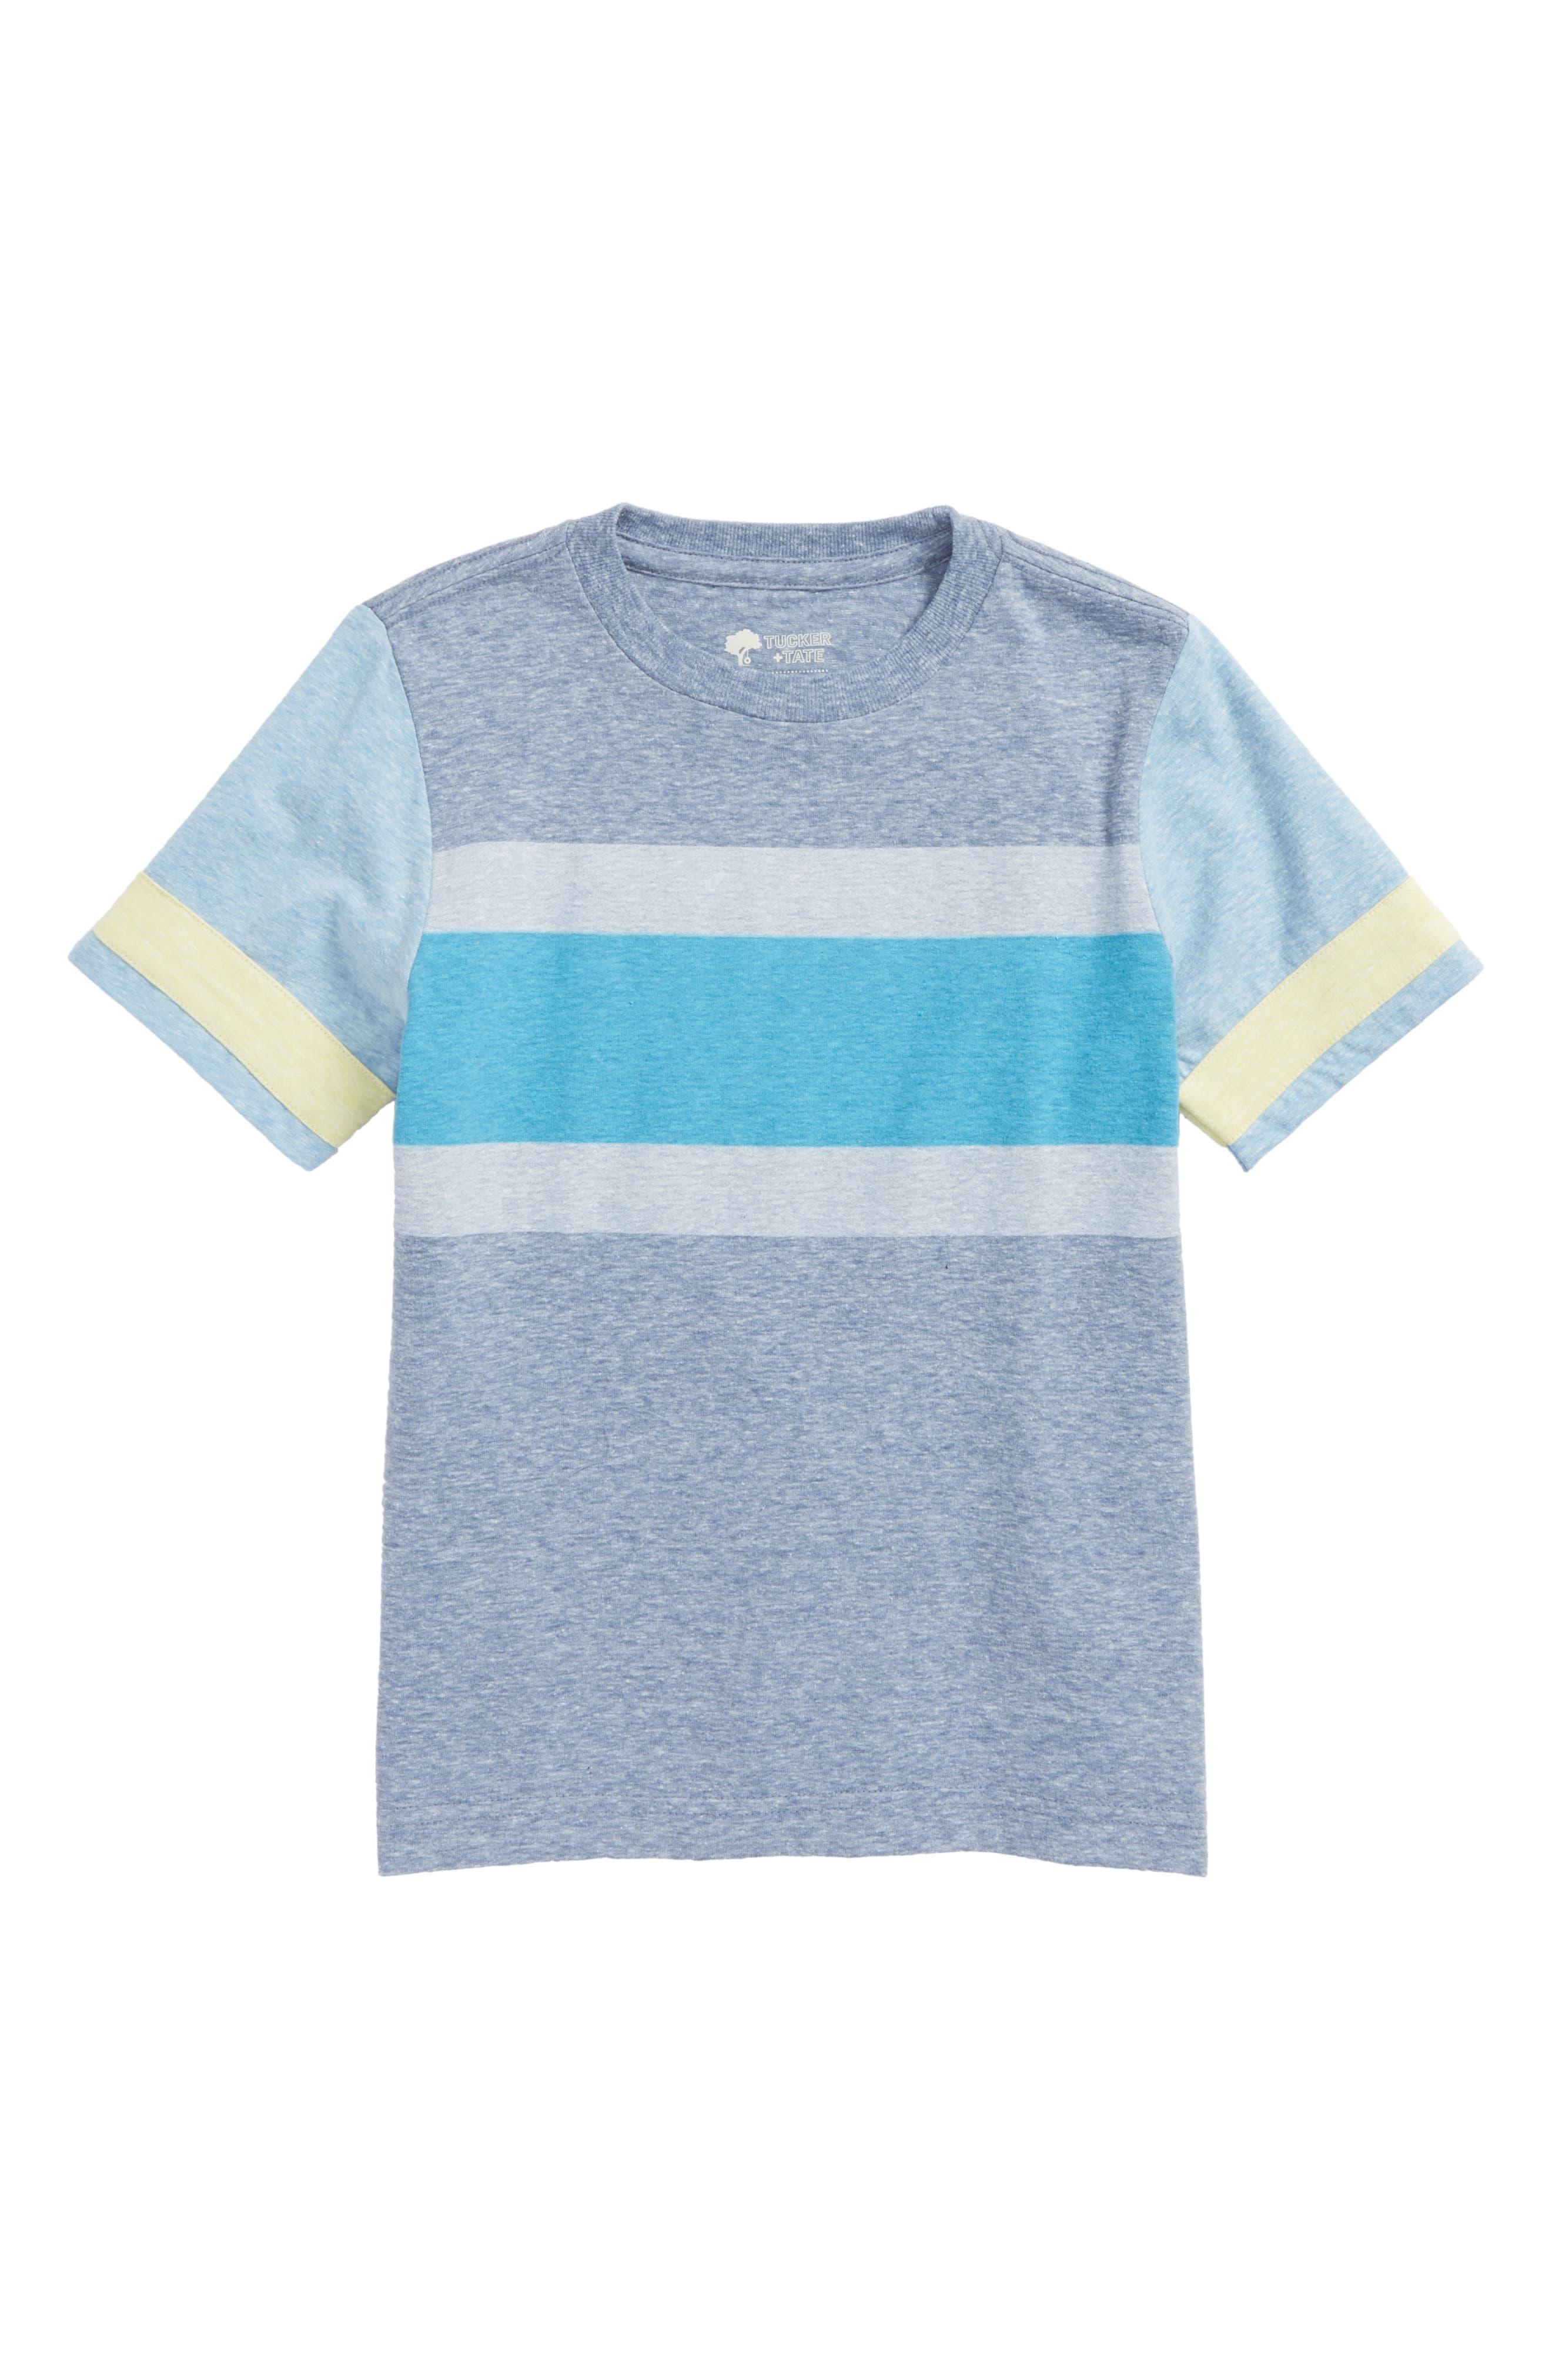 Main Image - Tucker + Tate Stripe T-Shirt (Toddler Boys & Little Boys)